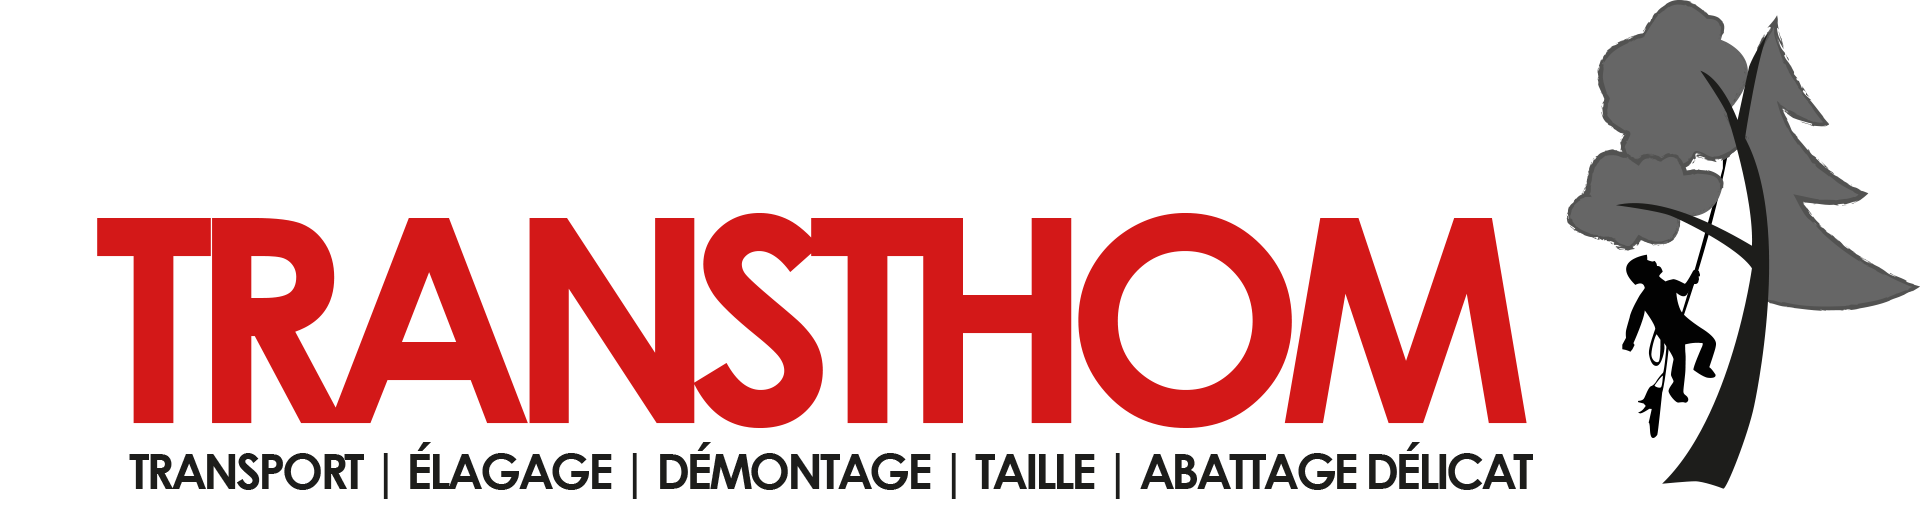 logo_transthom